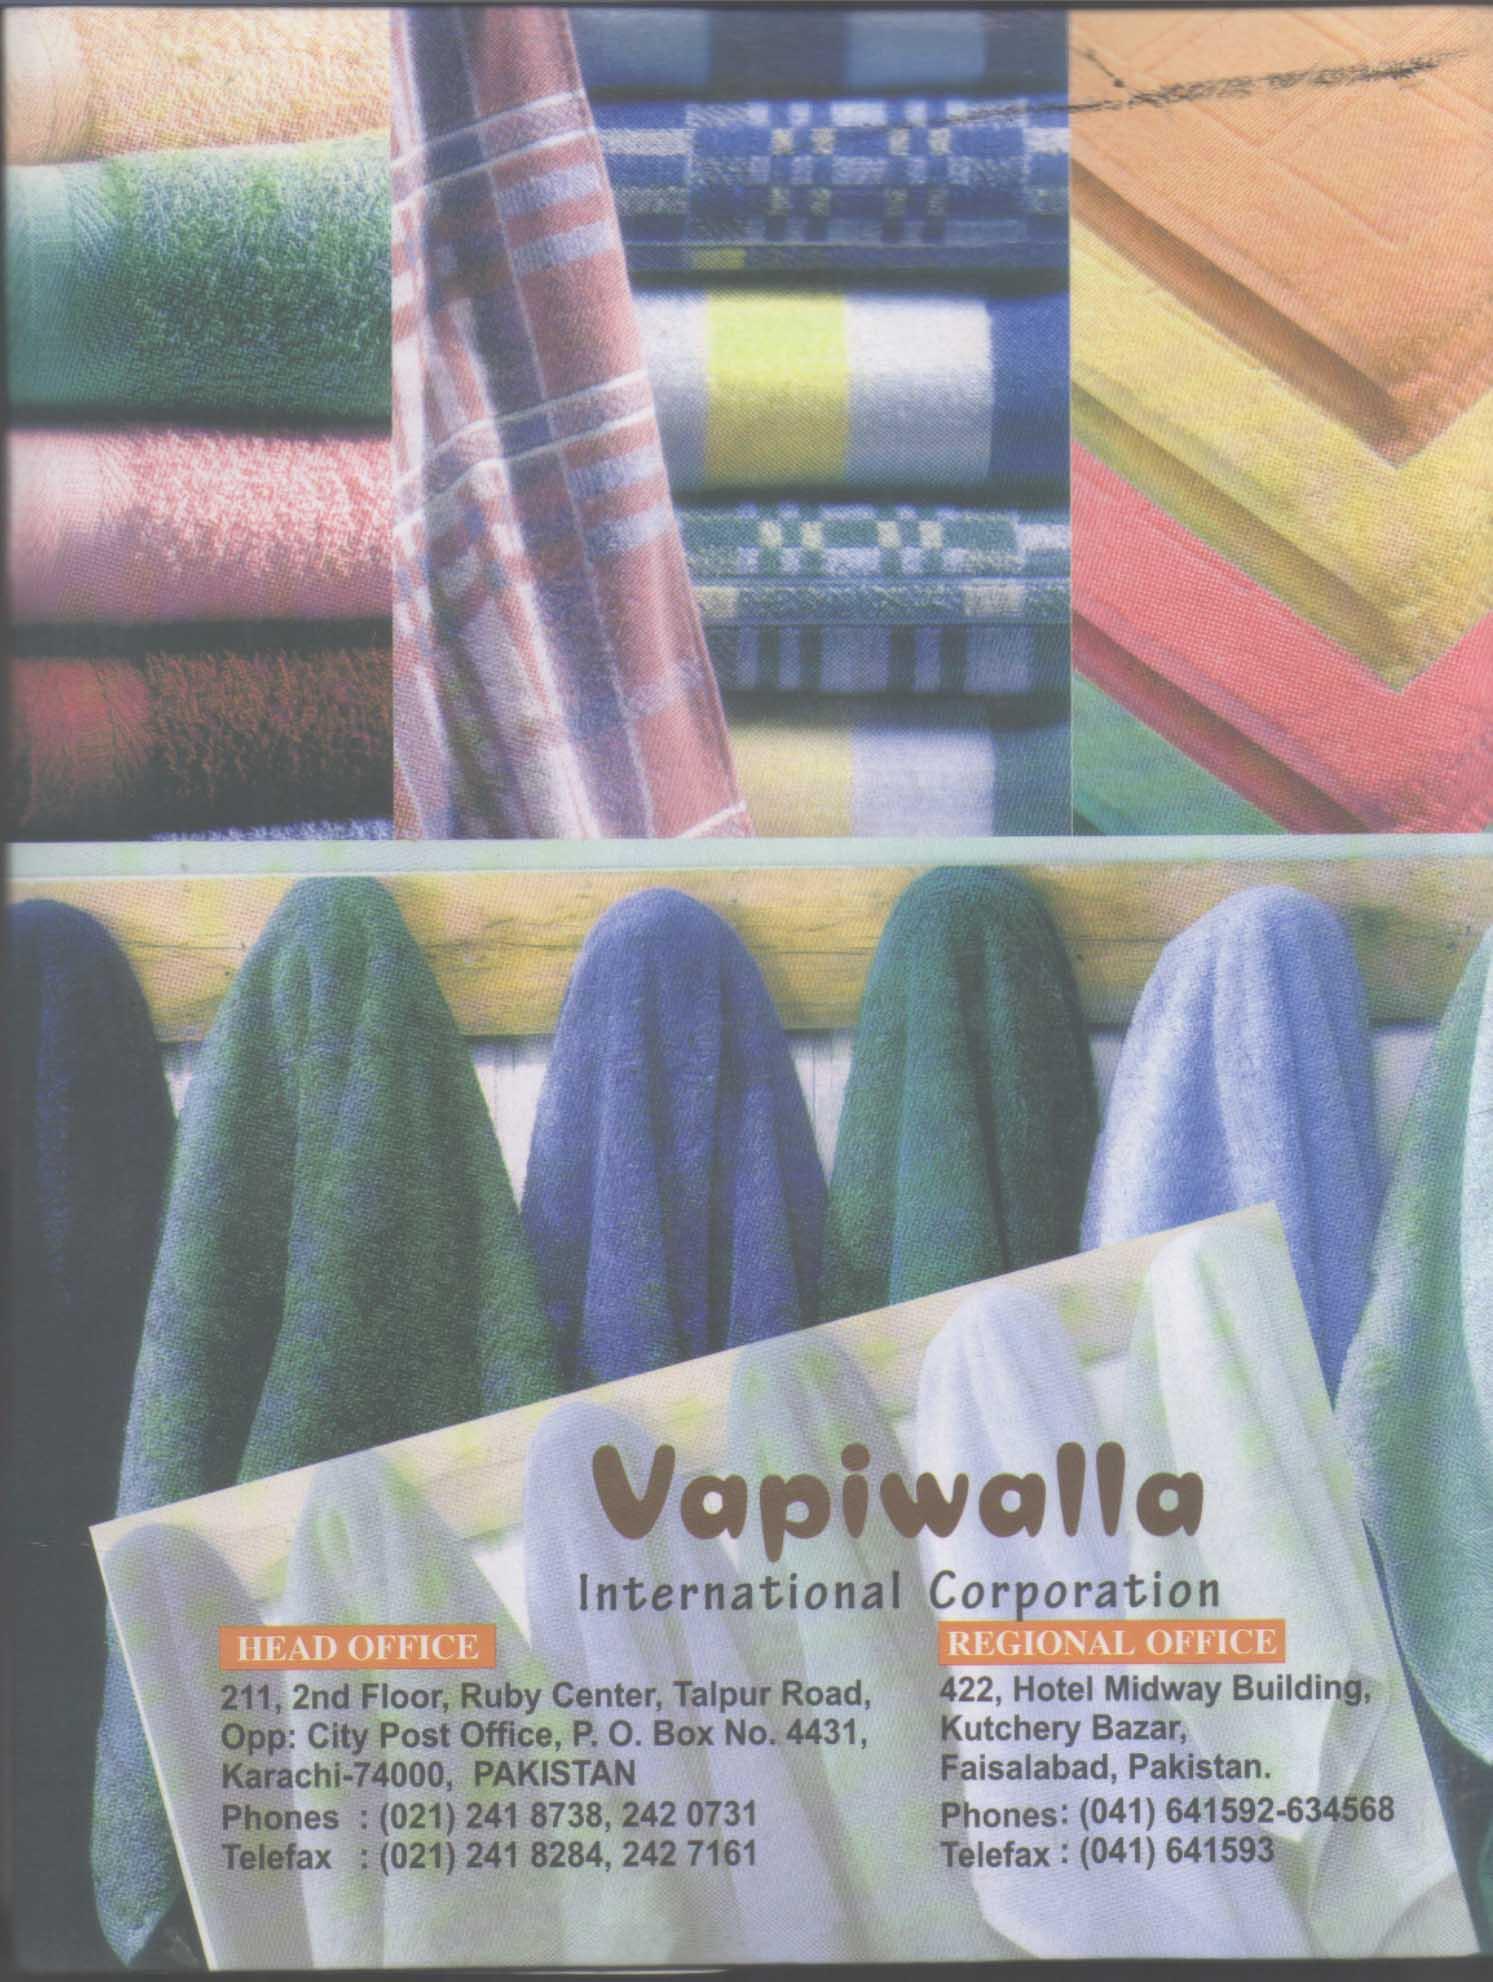 VAPIWALLA INTERNATIONAL CORPORATION logo